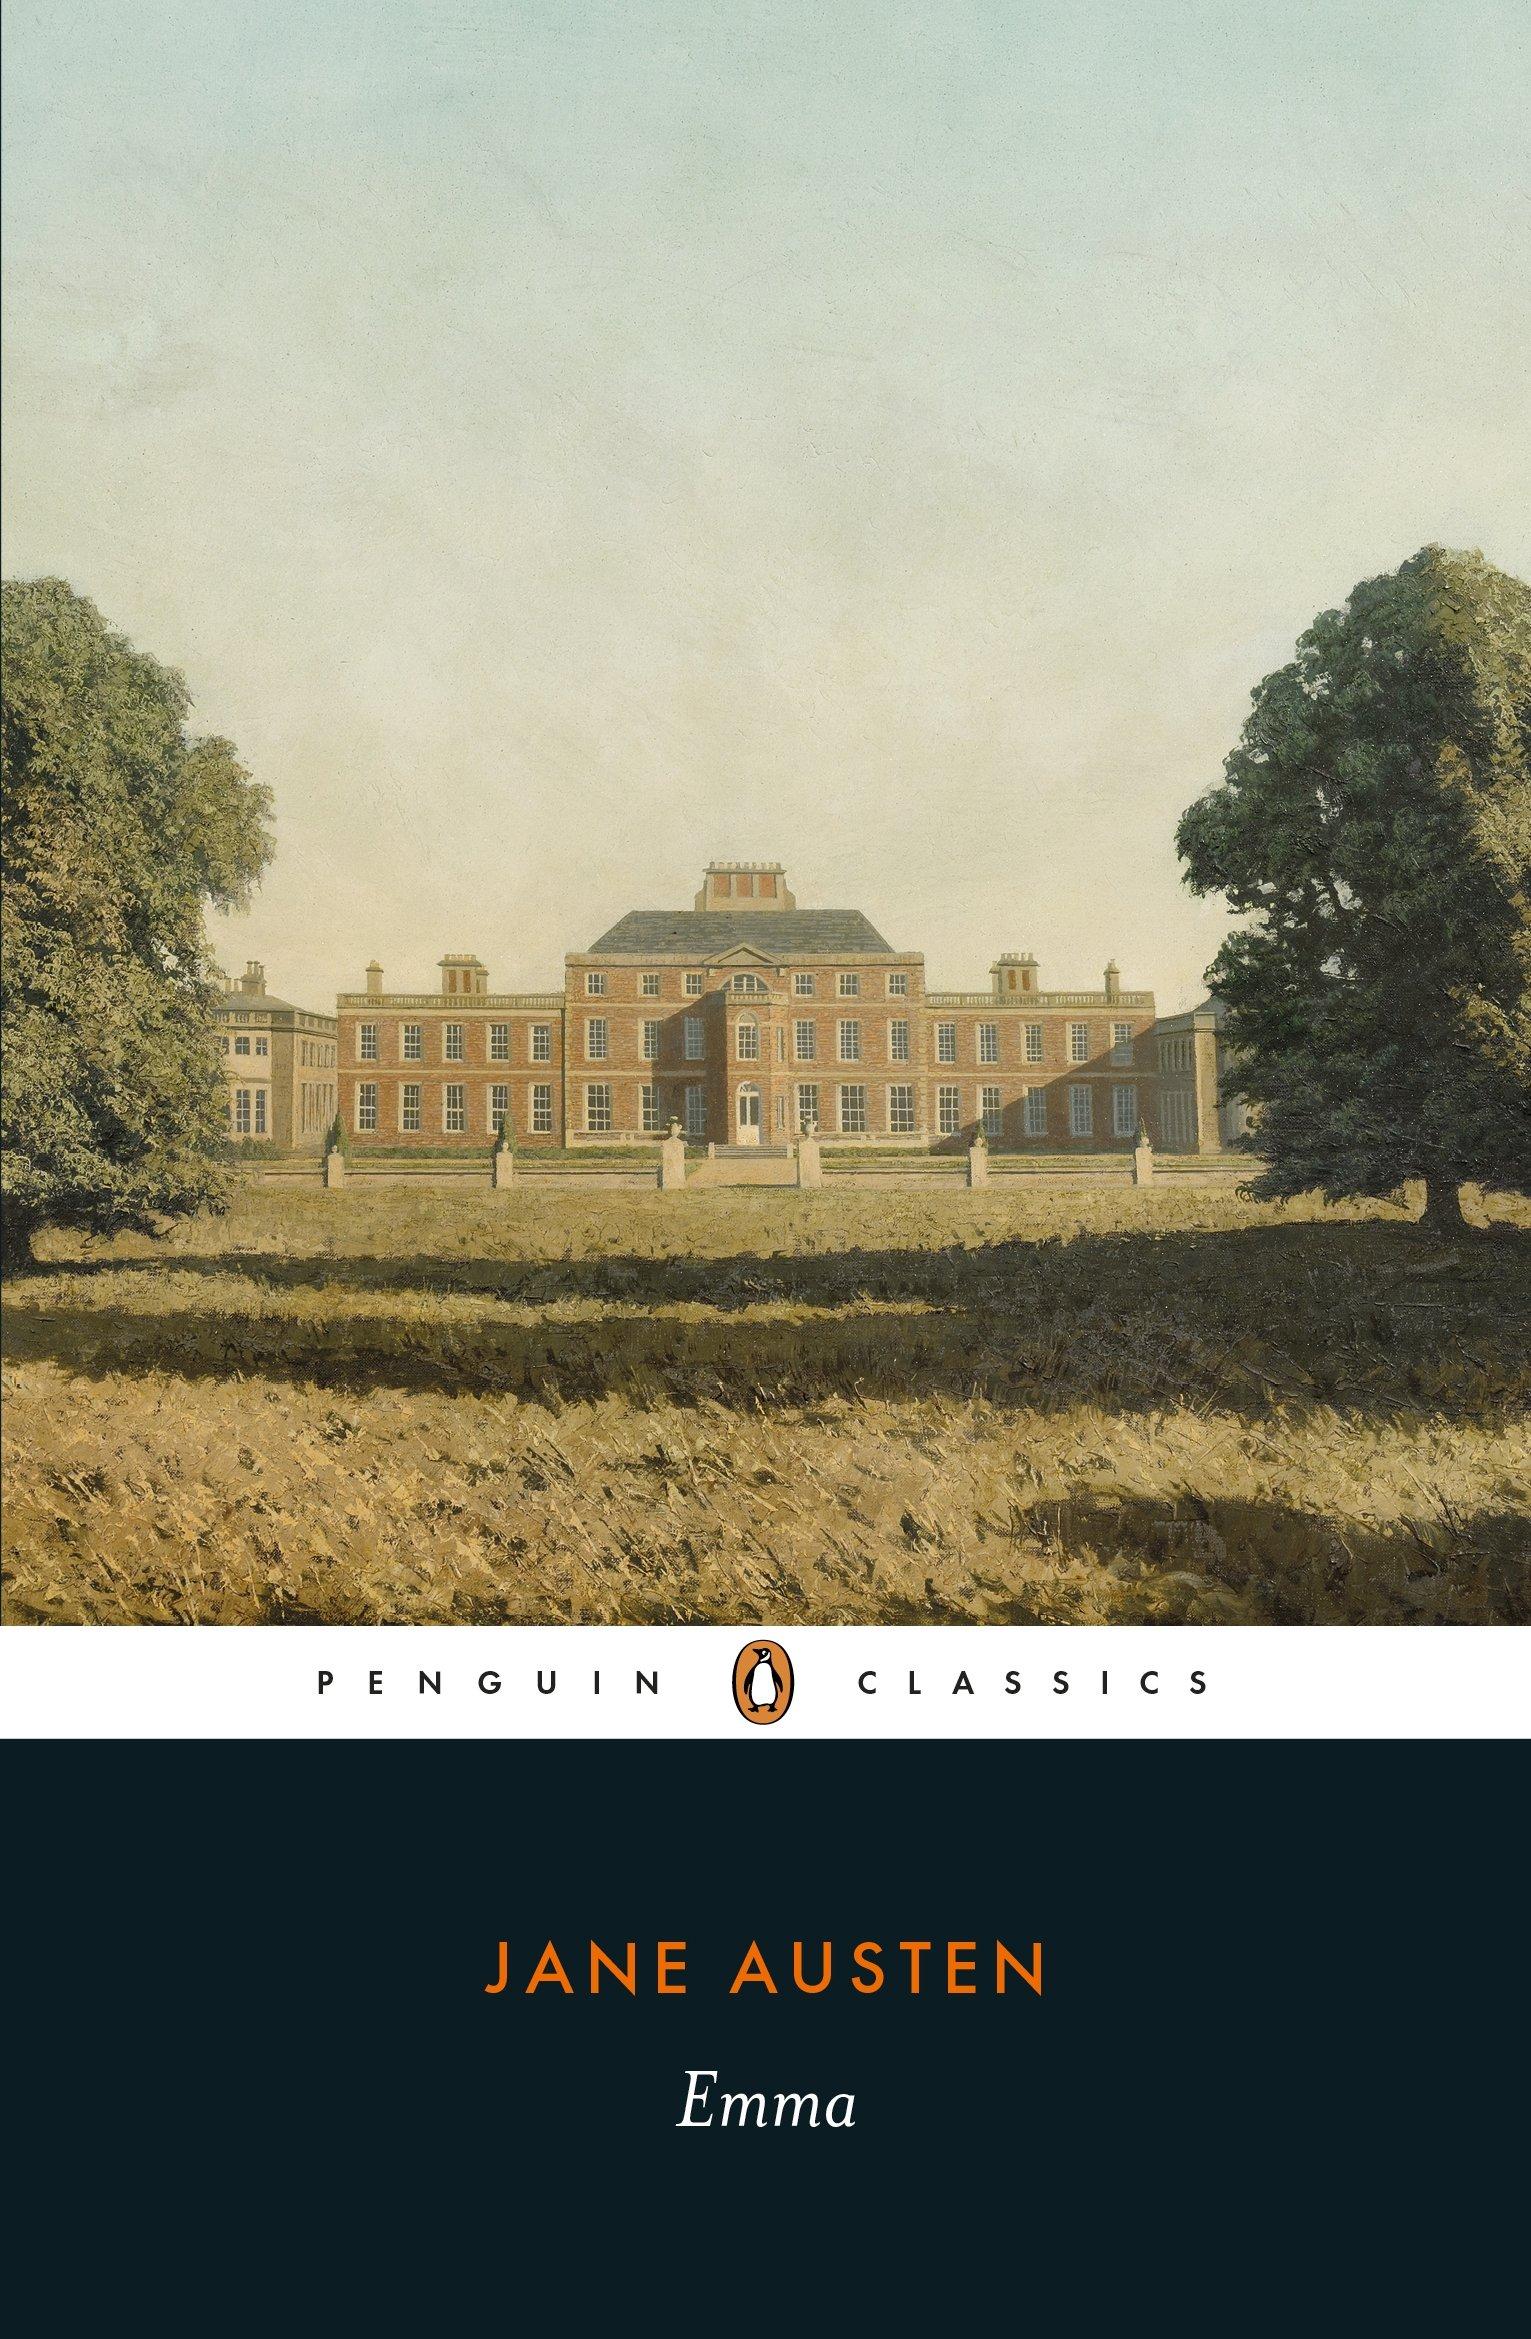 Emma Penguin Classics Jane Austen product image